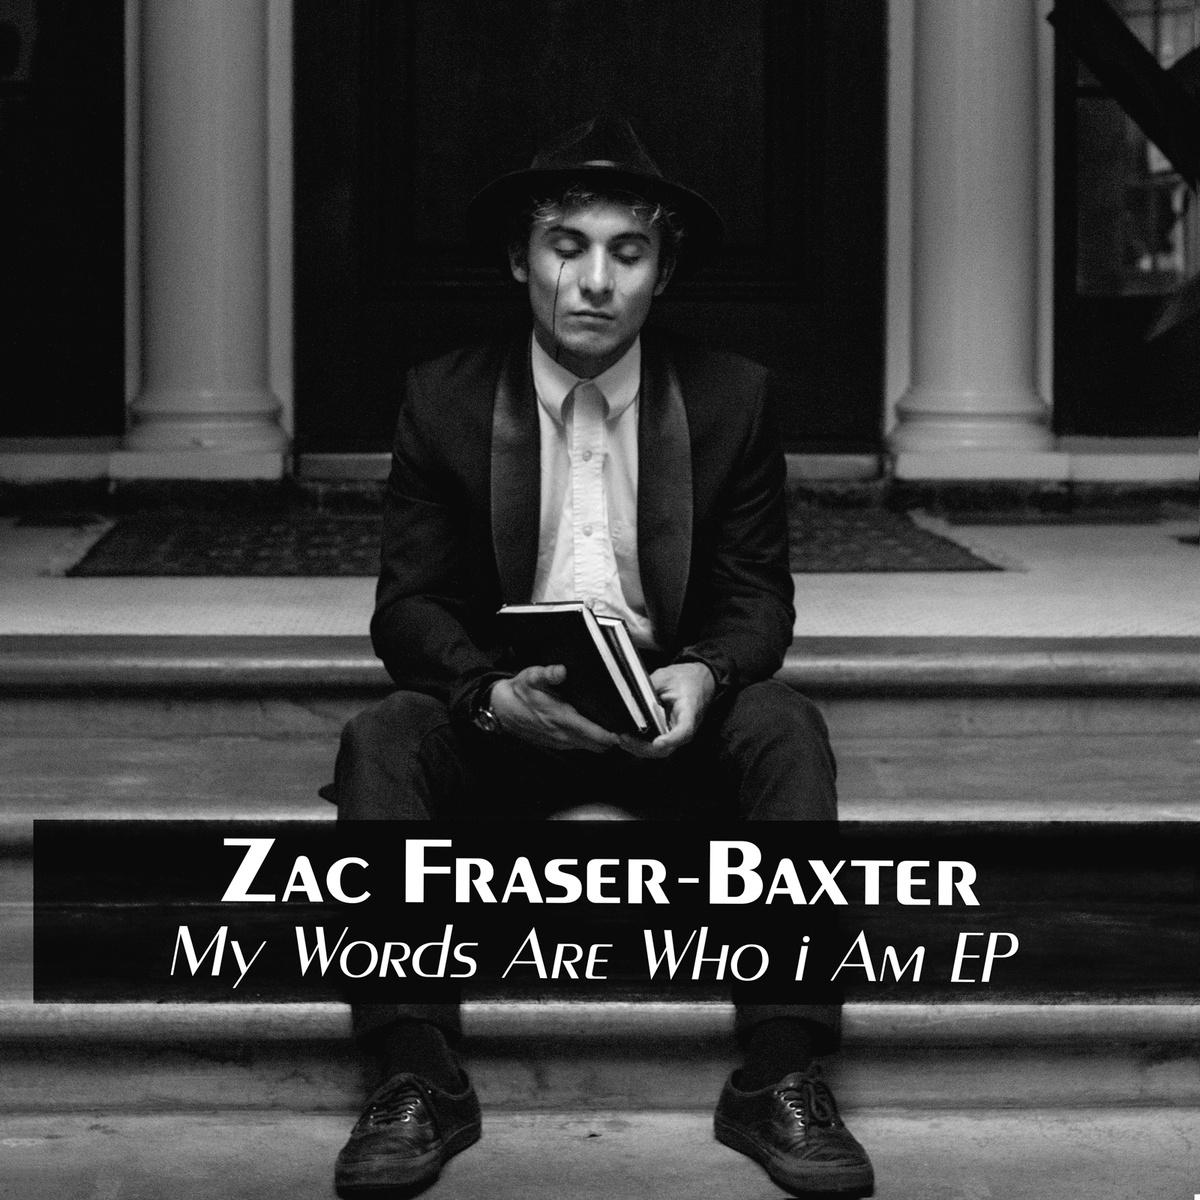 Zac Fraser-Baxter